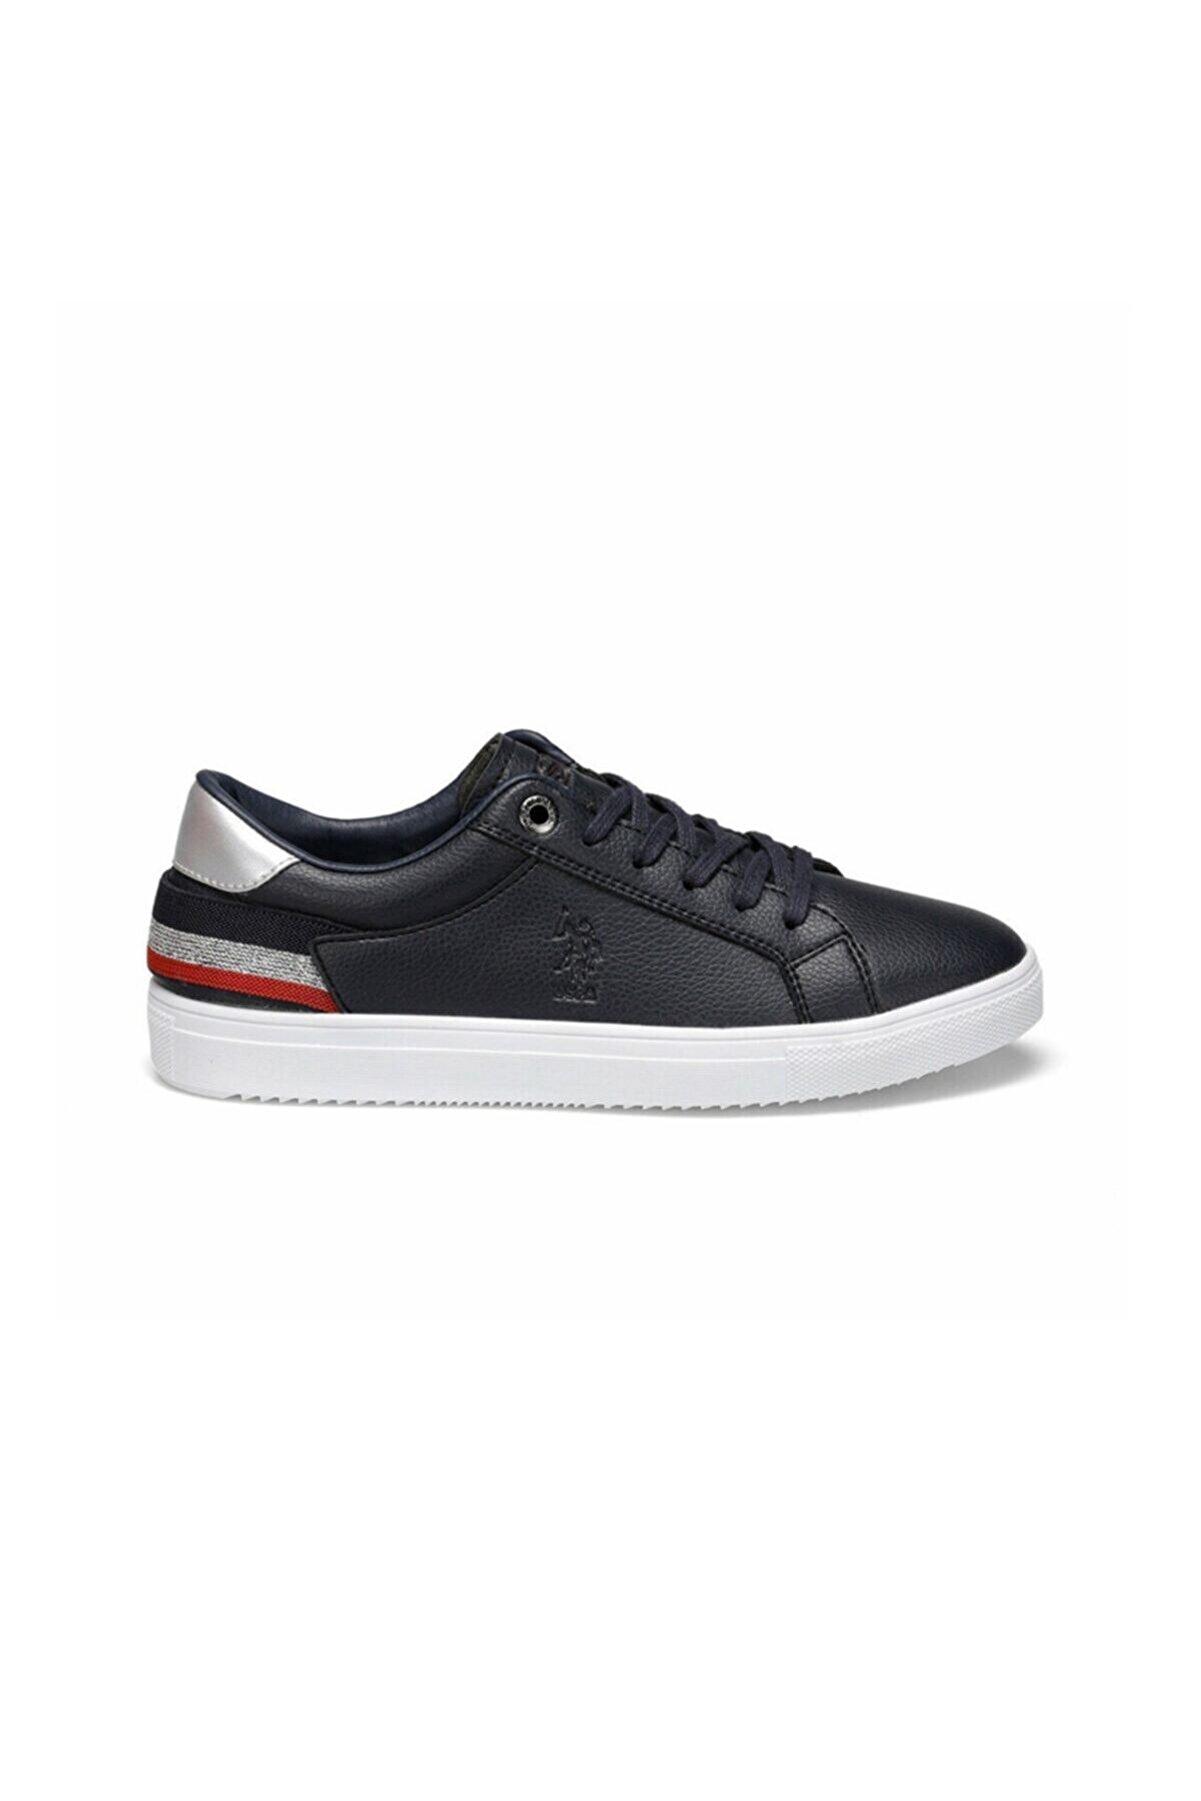 US Polo Assn TORY Lacivert Kadın Sneaker Ayakkabı 100504910